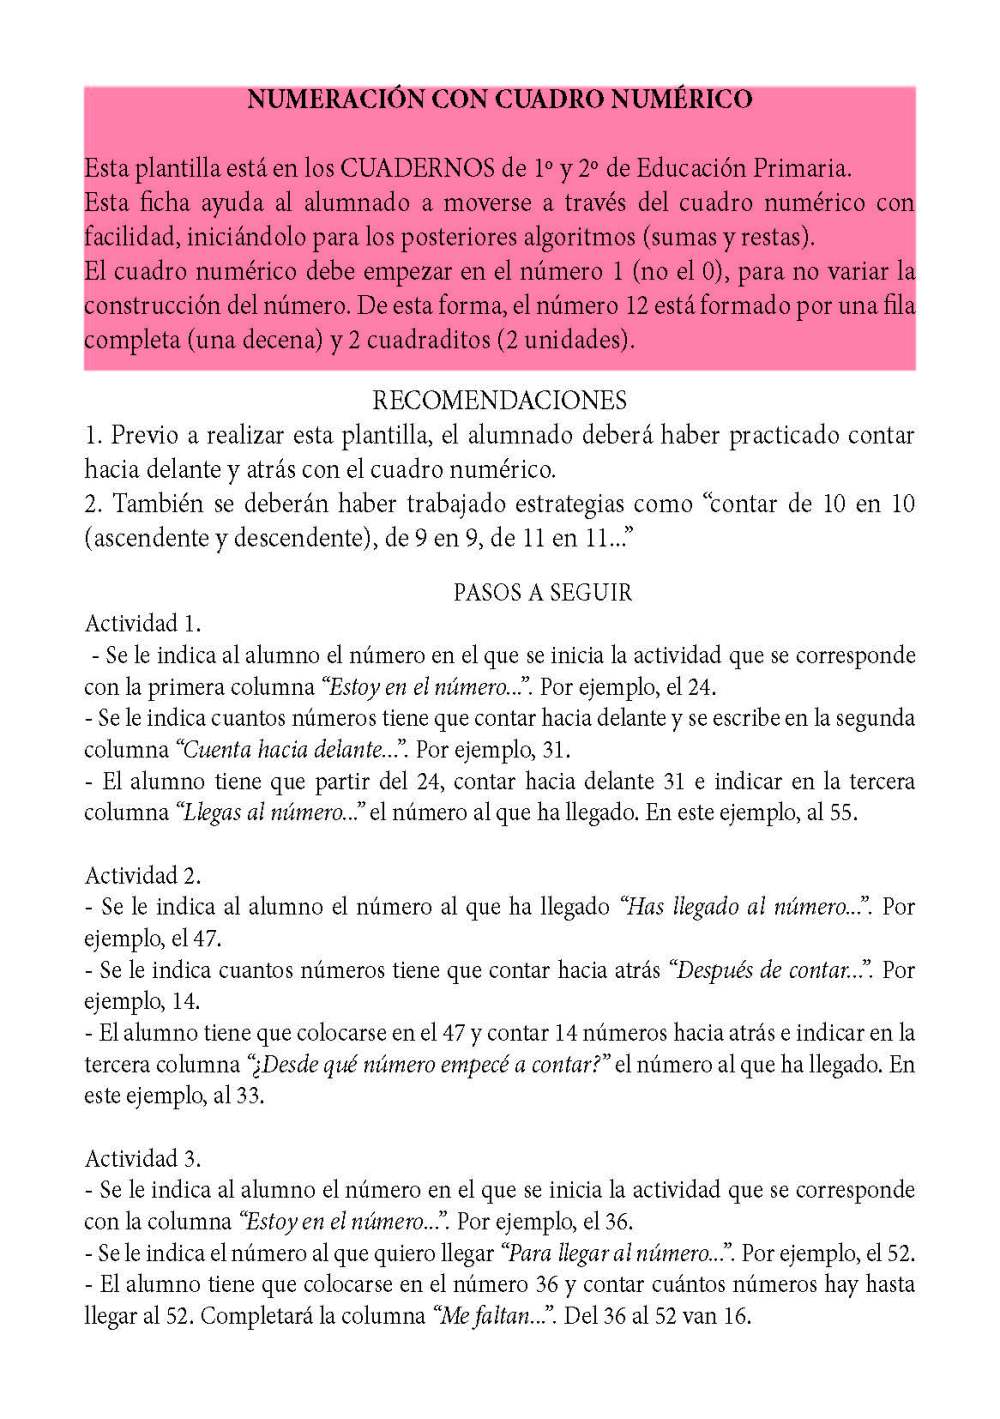 cuaderno-simo-2016-completo_pagina_12